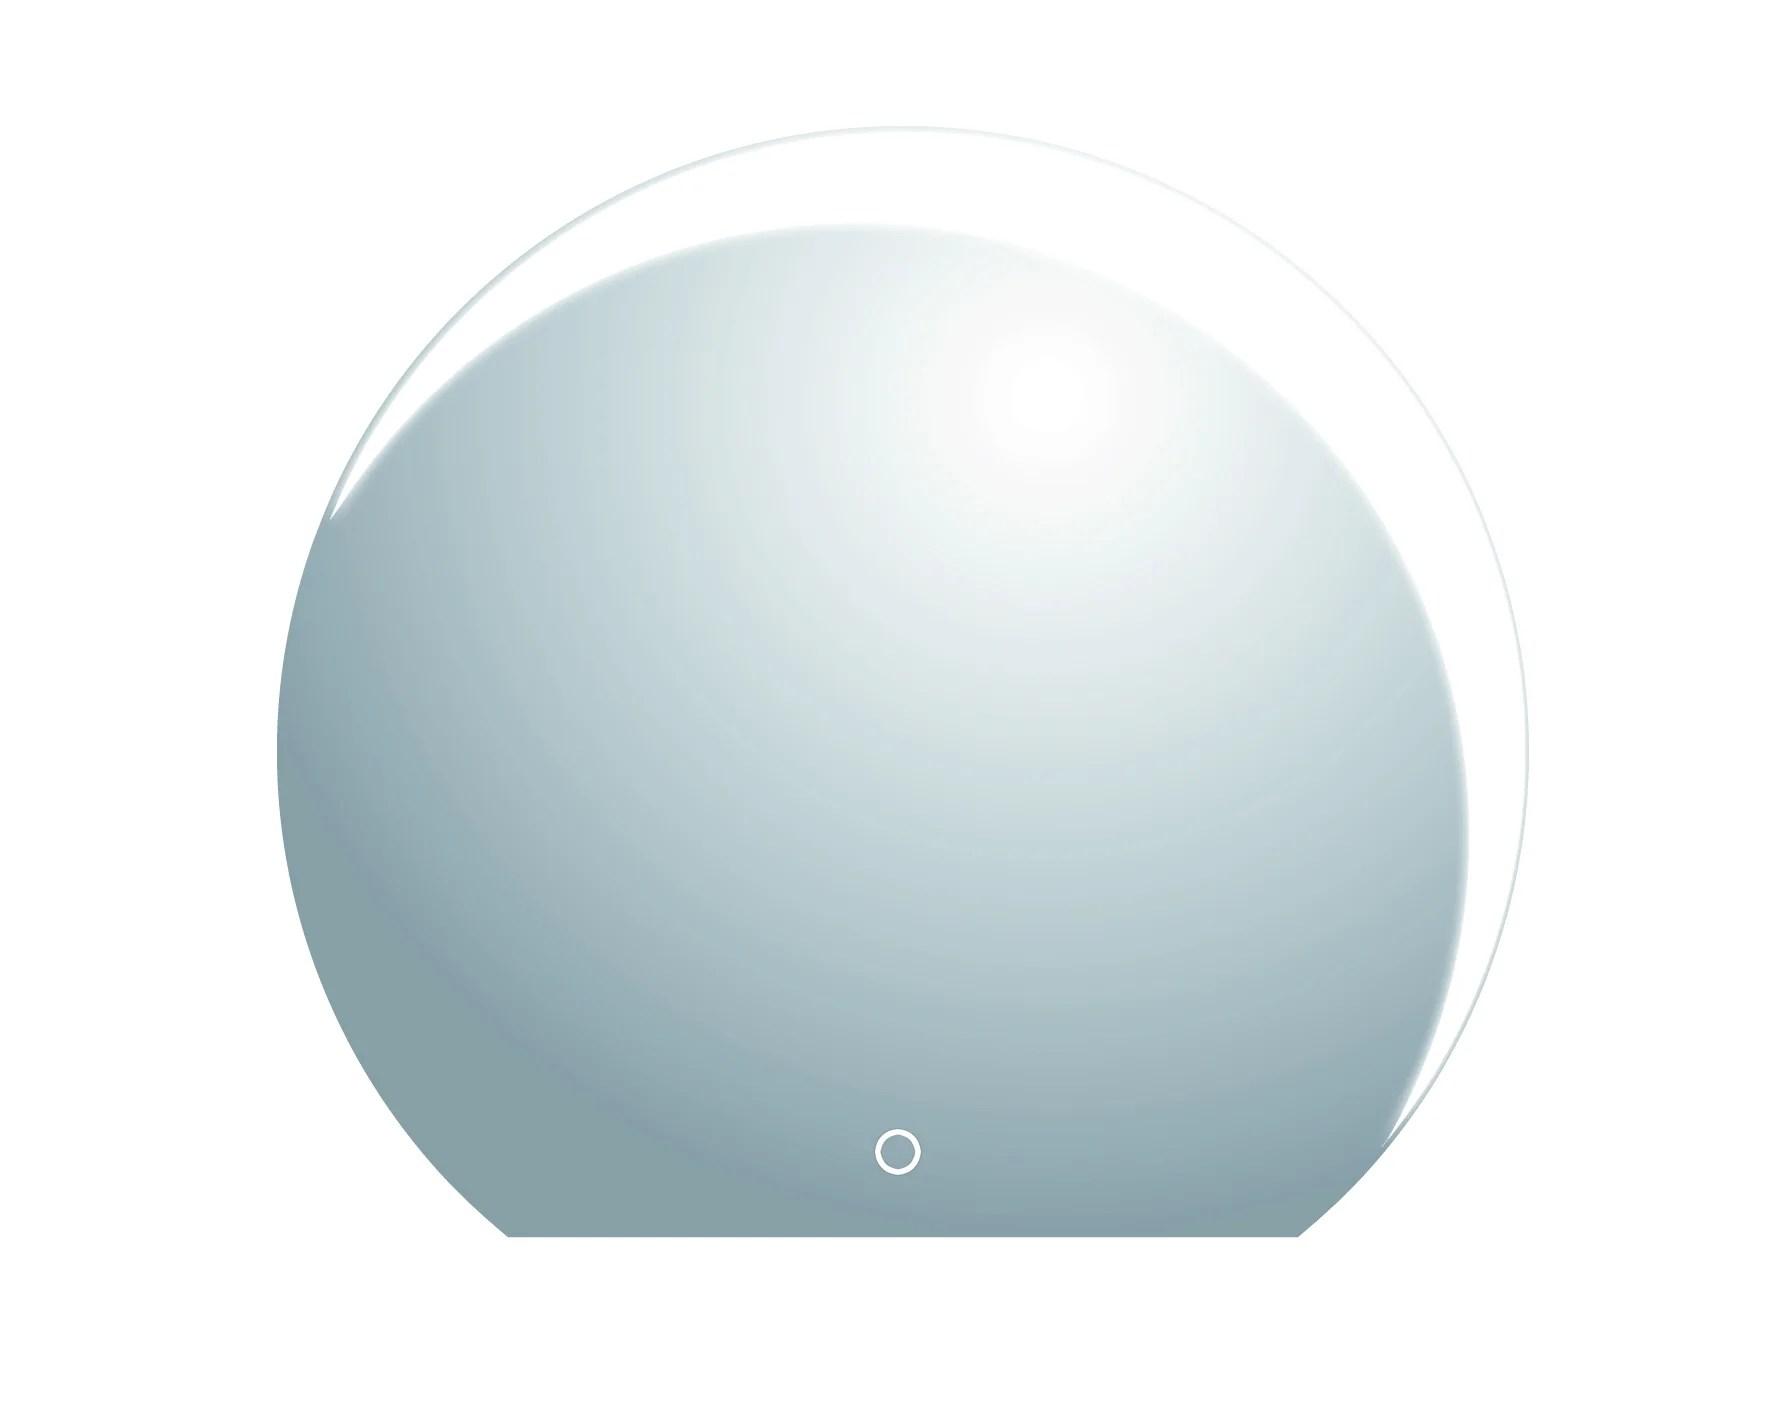 Miroir Non Lumineux Decoupe Deco L 50 X L 70 5 Cm Poli Leroy Merlin